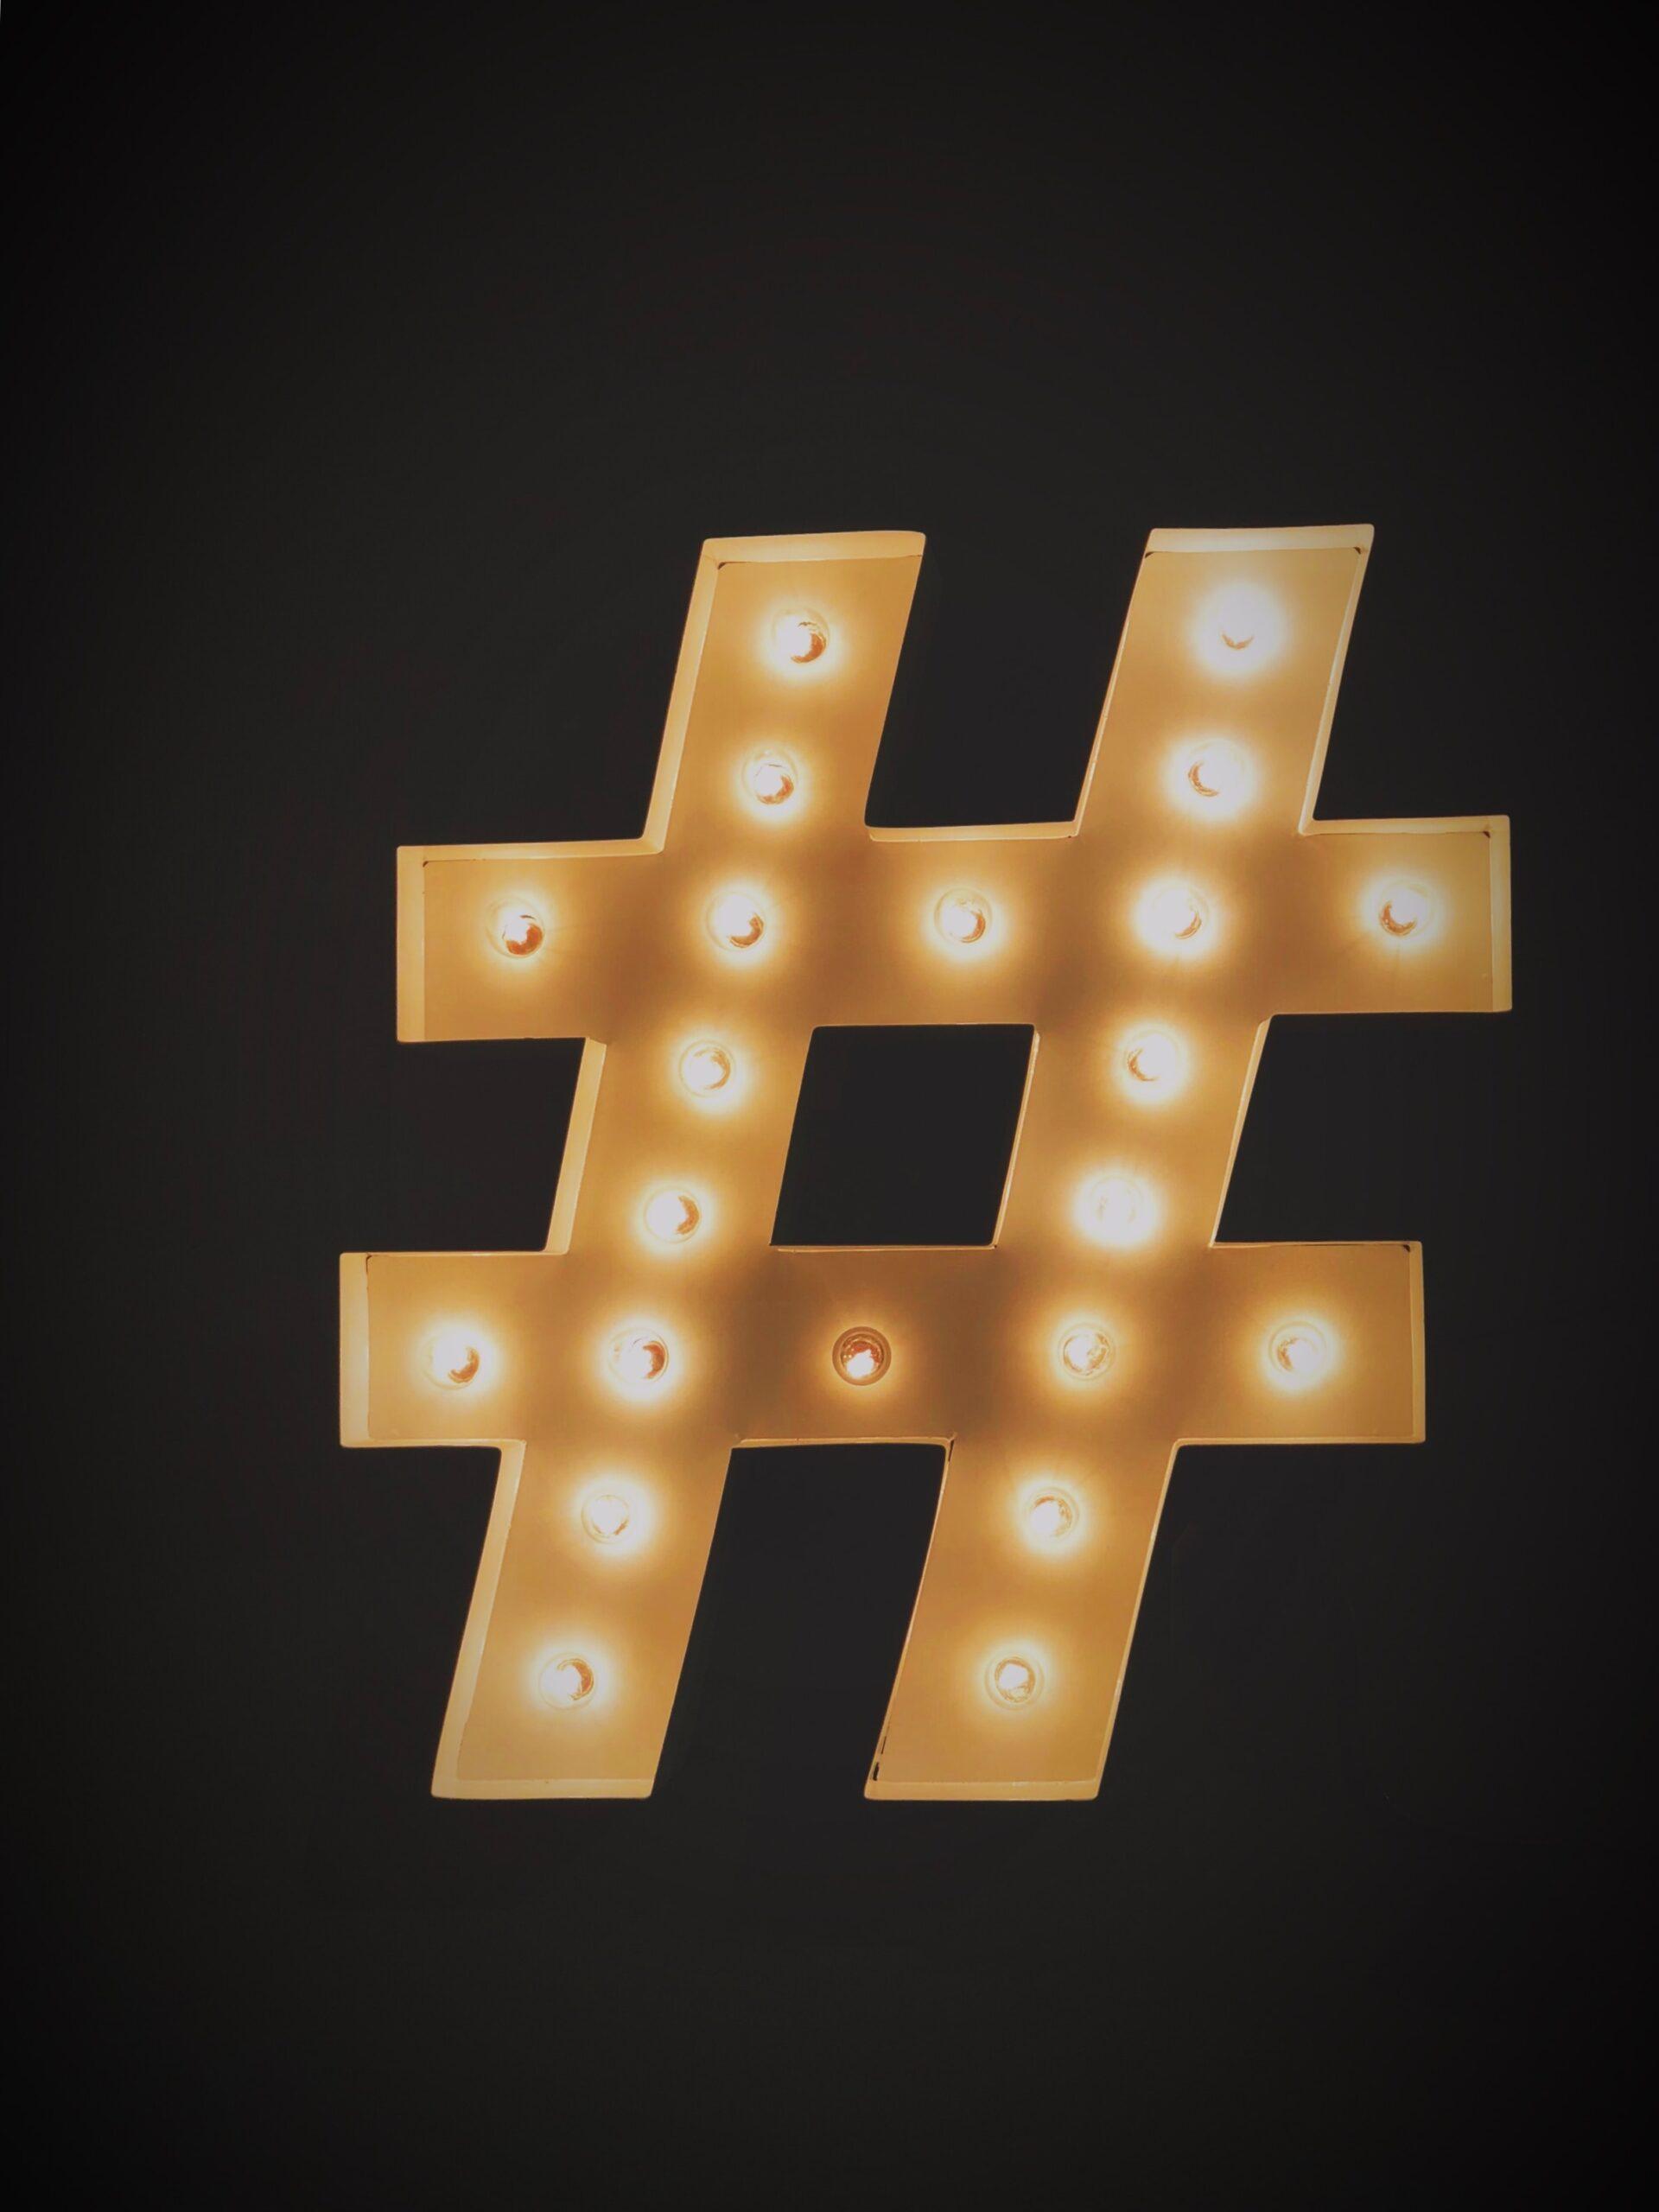 social media marketing  hashtag